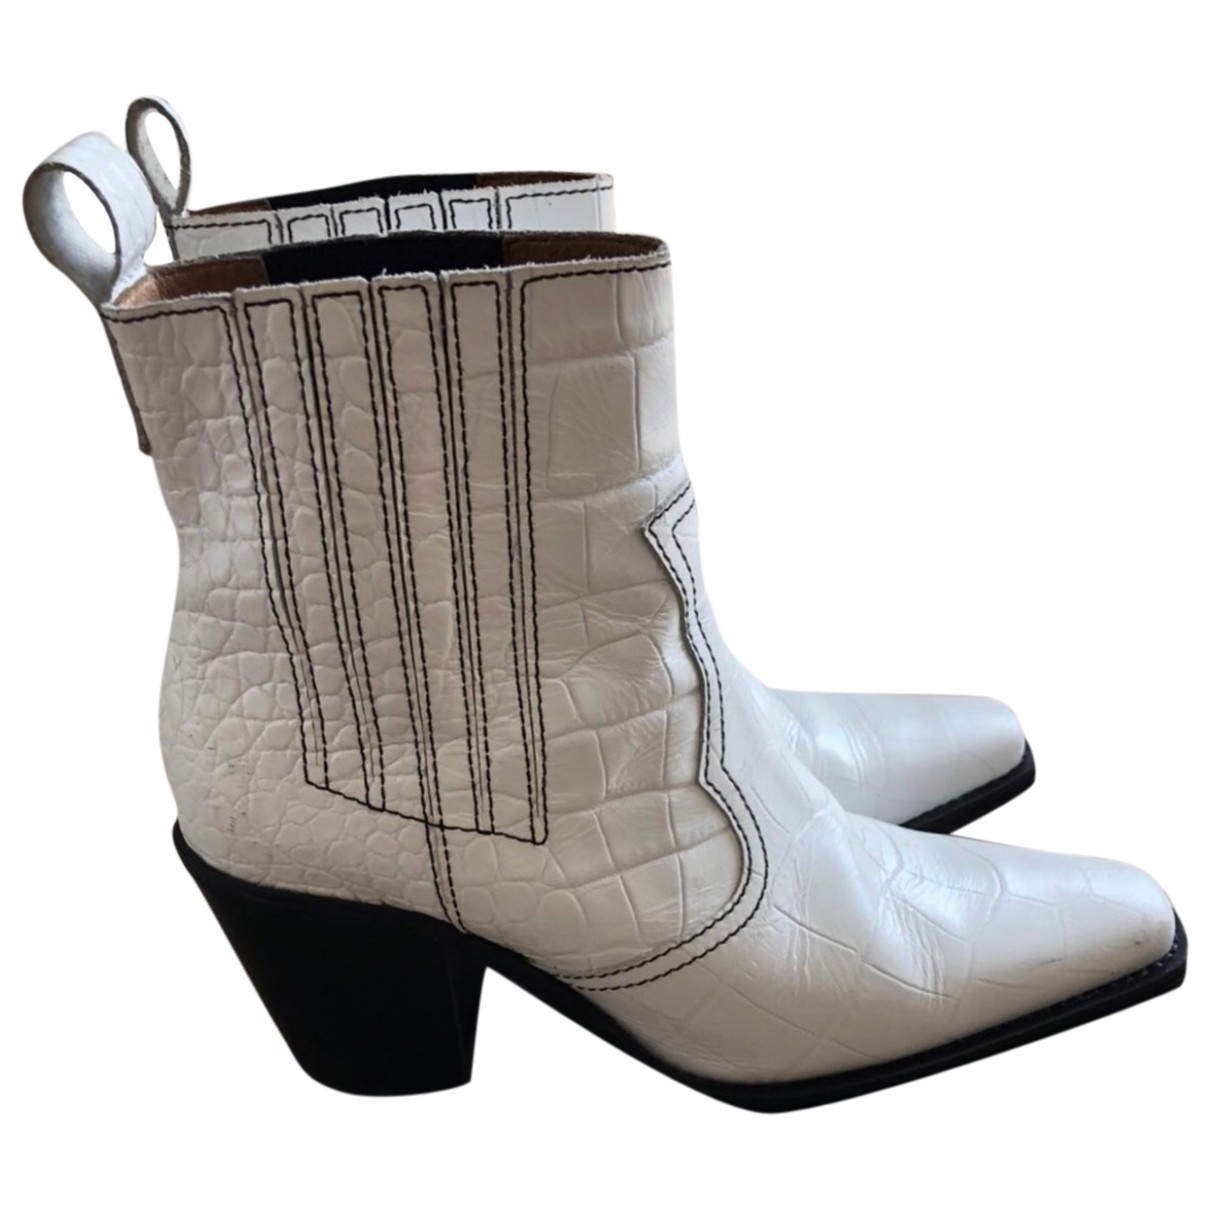 Ganni - Boots Fall Winter 2019 pour femme en cuir - blanc